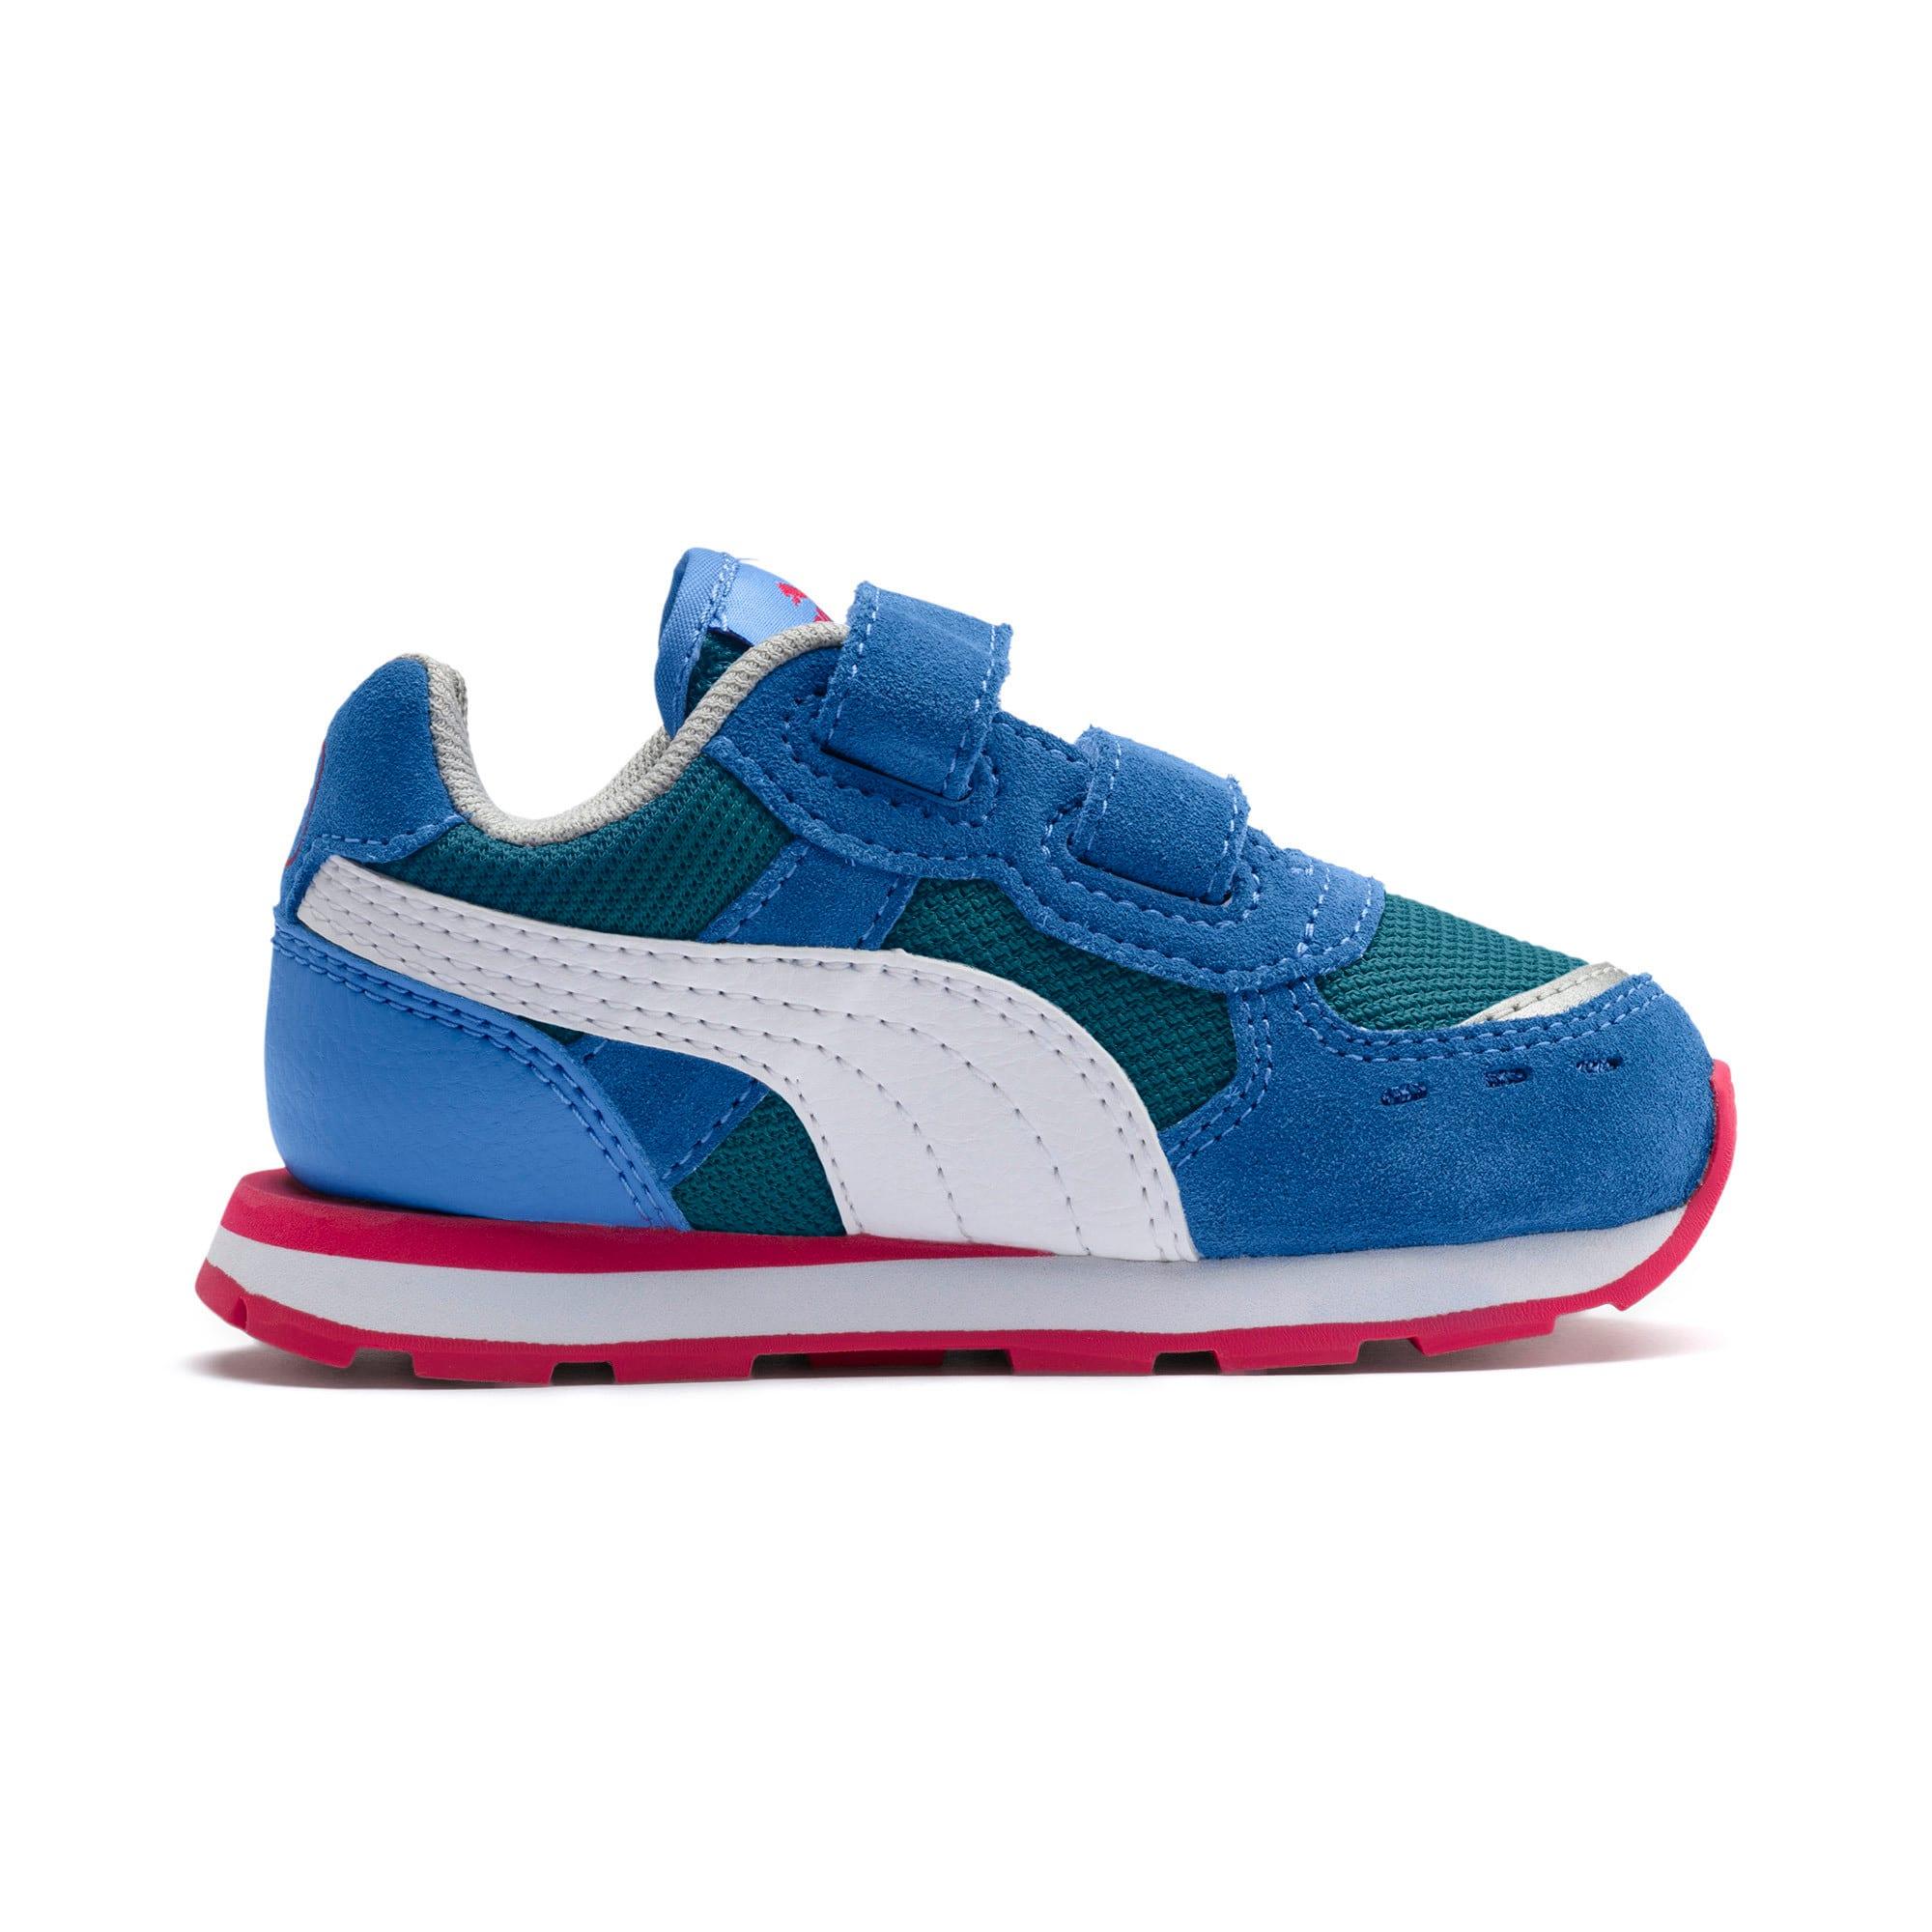 Thumbnail 5 of Vista Toddler Shoes, Ultramarine-Puma White, medium